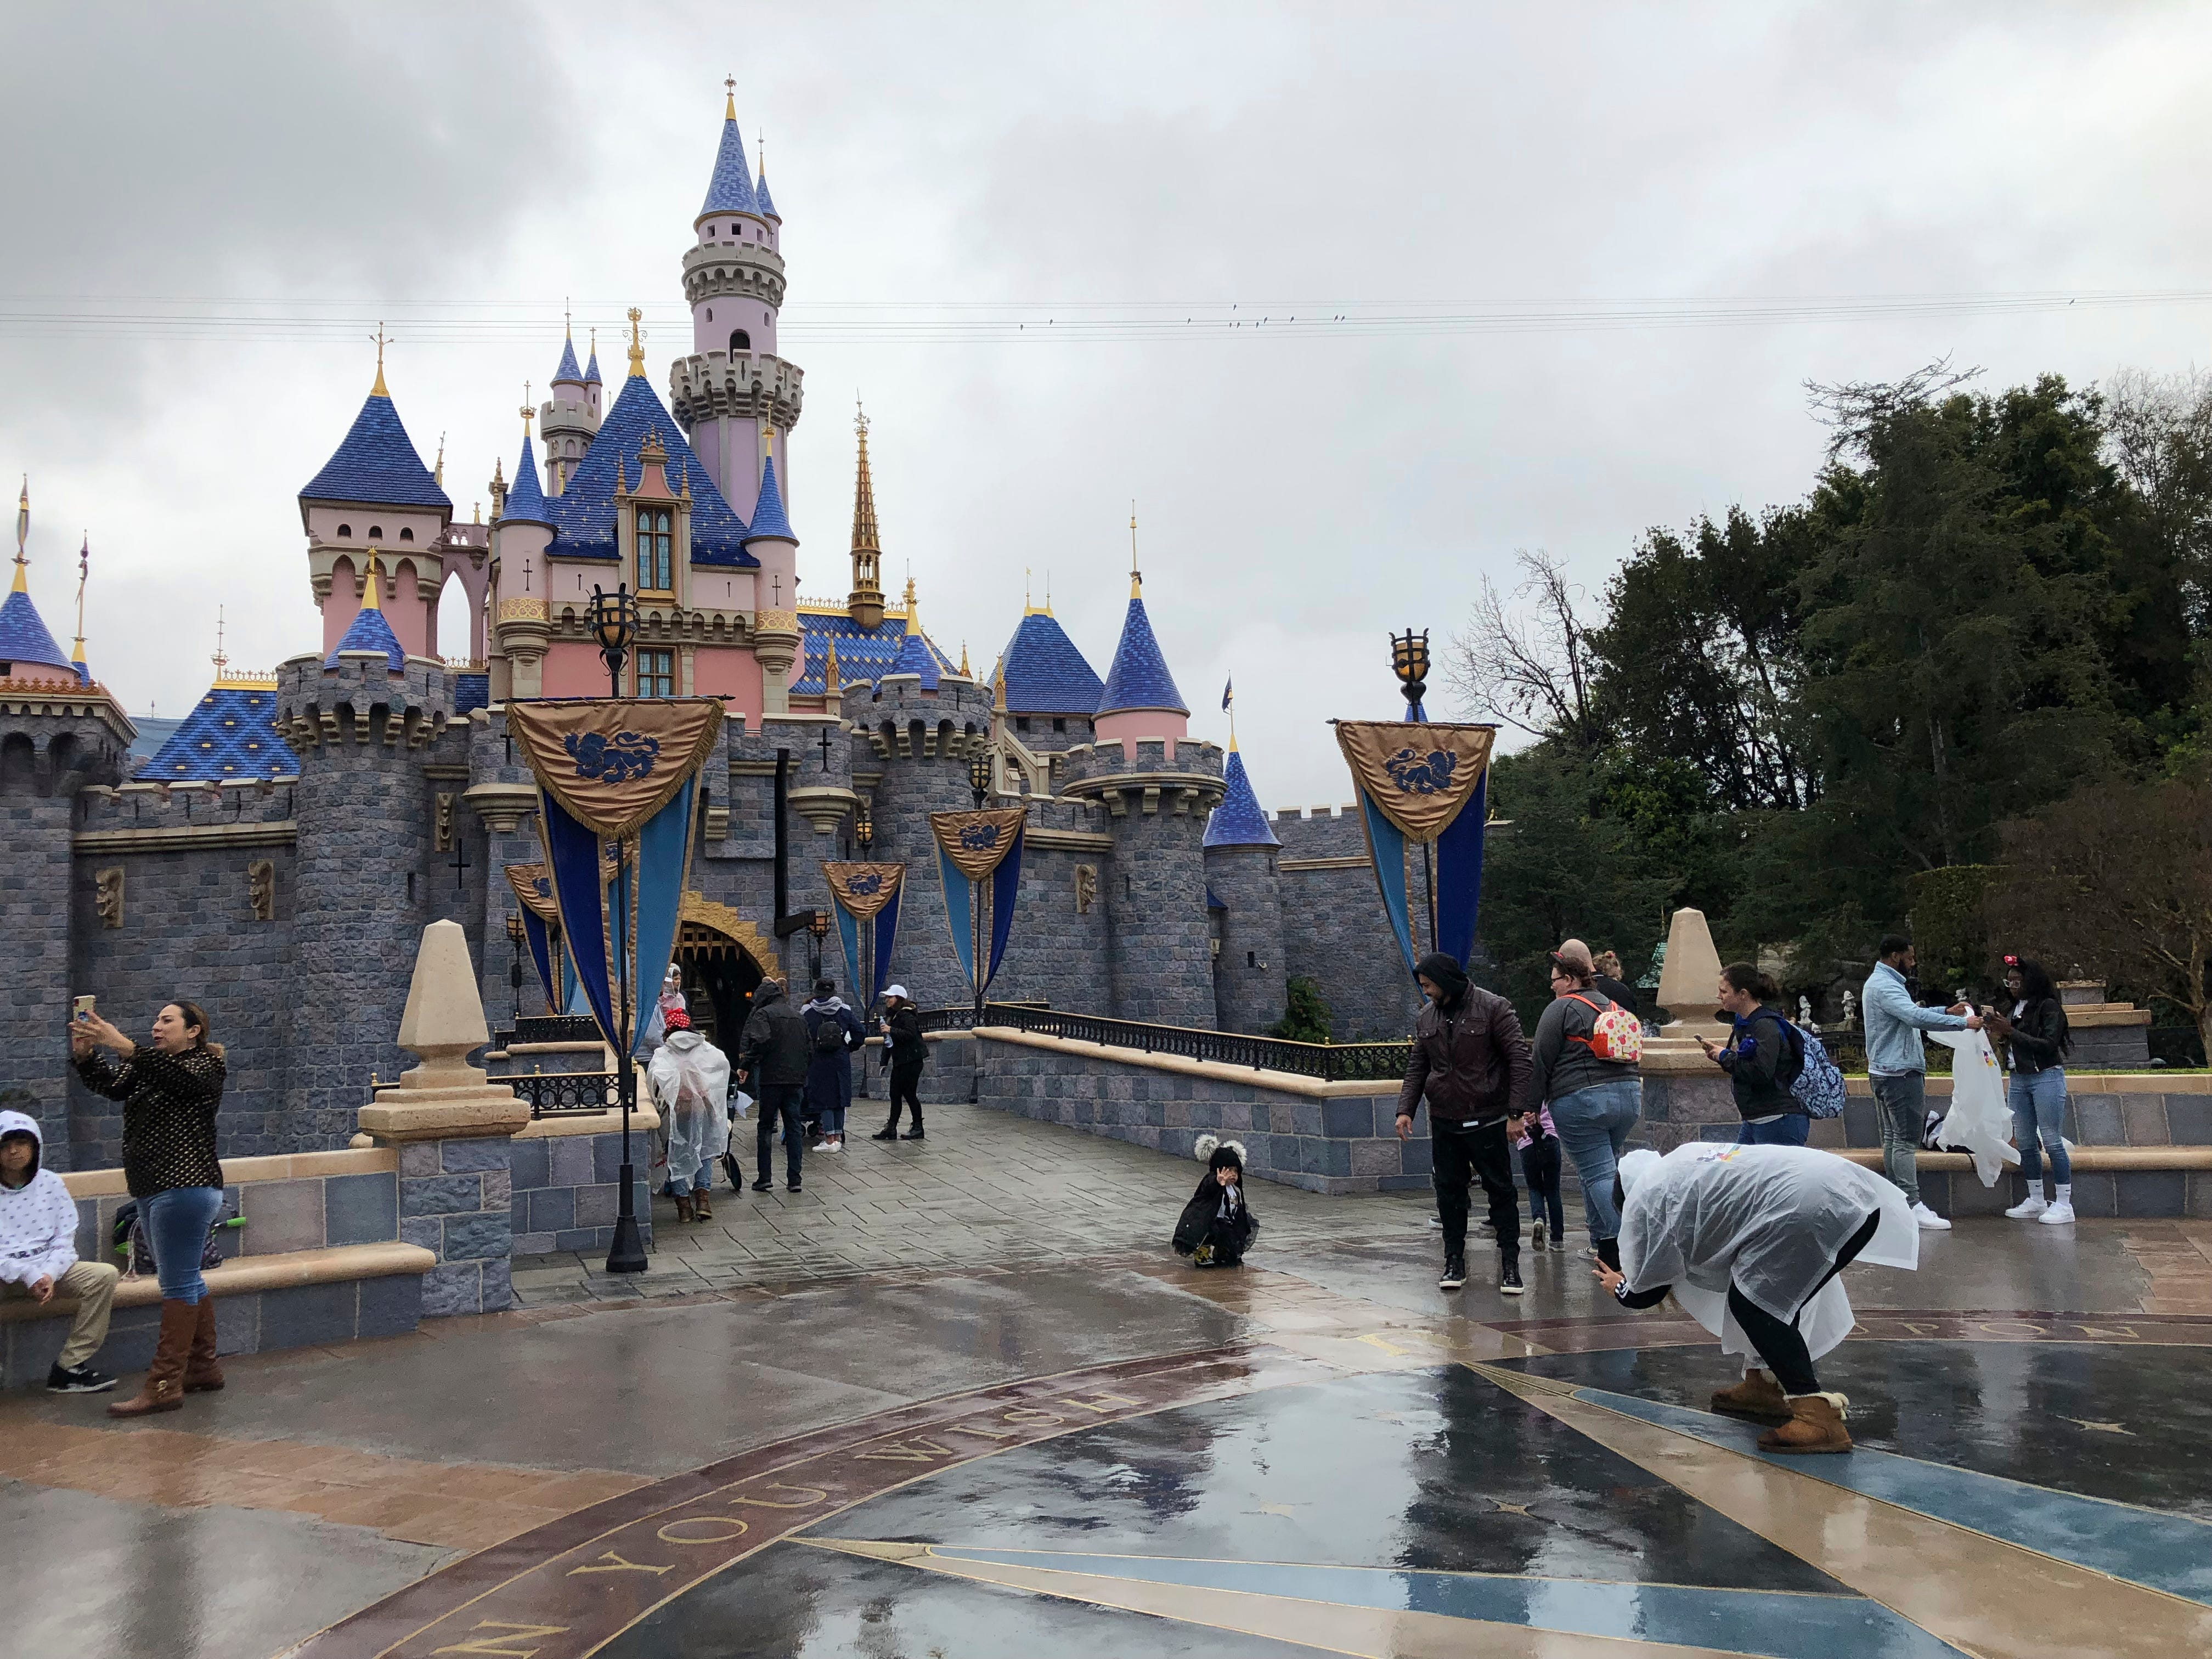 Disneyland Petition 35 000 Sign To Keep Park Closed Amid Coronavirus